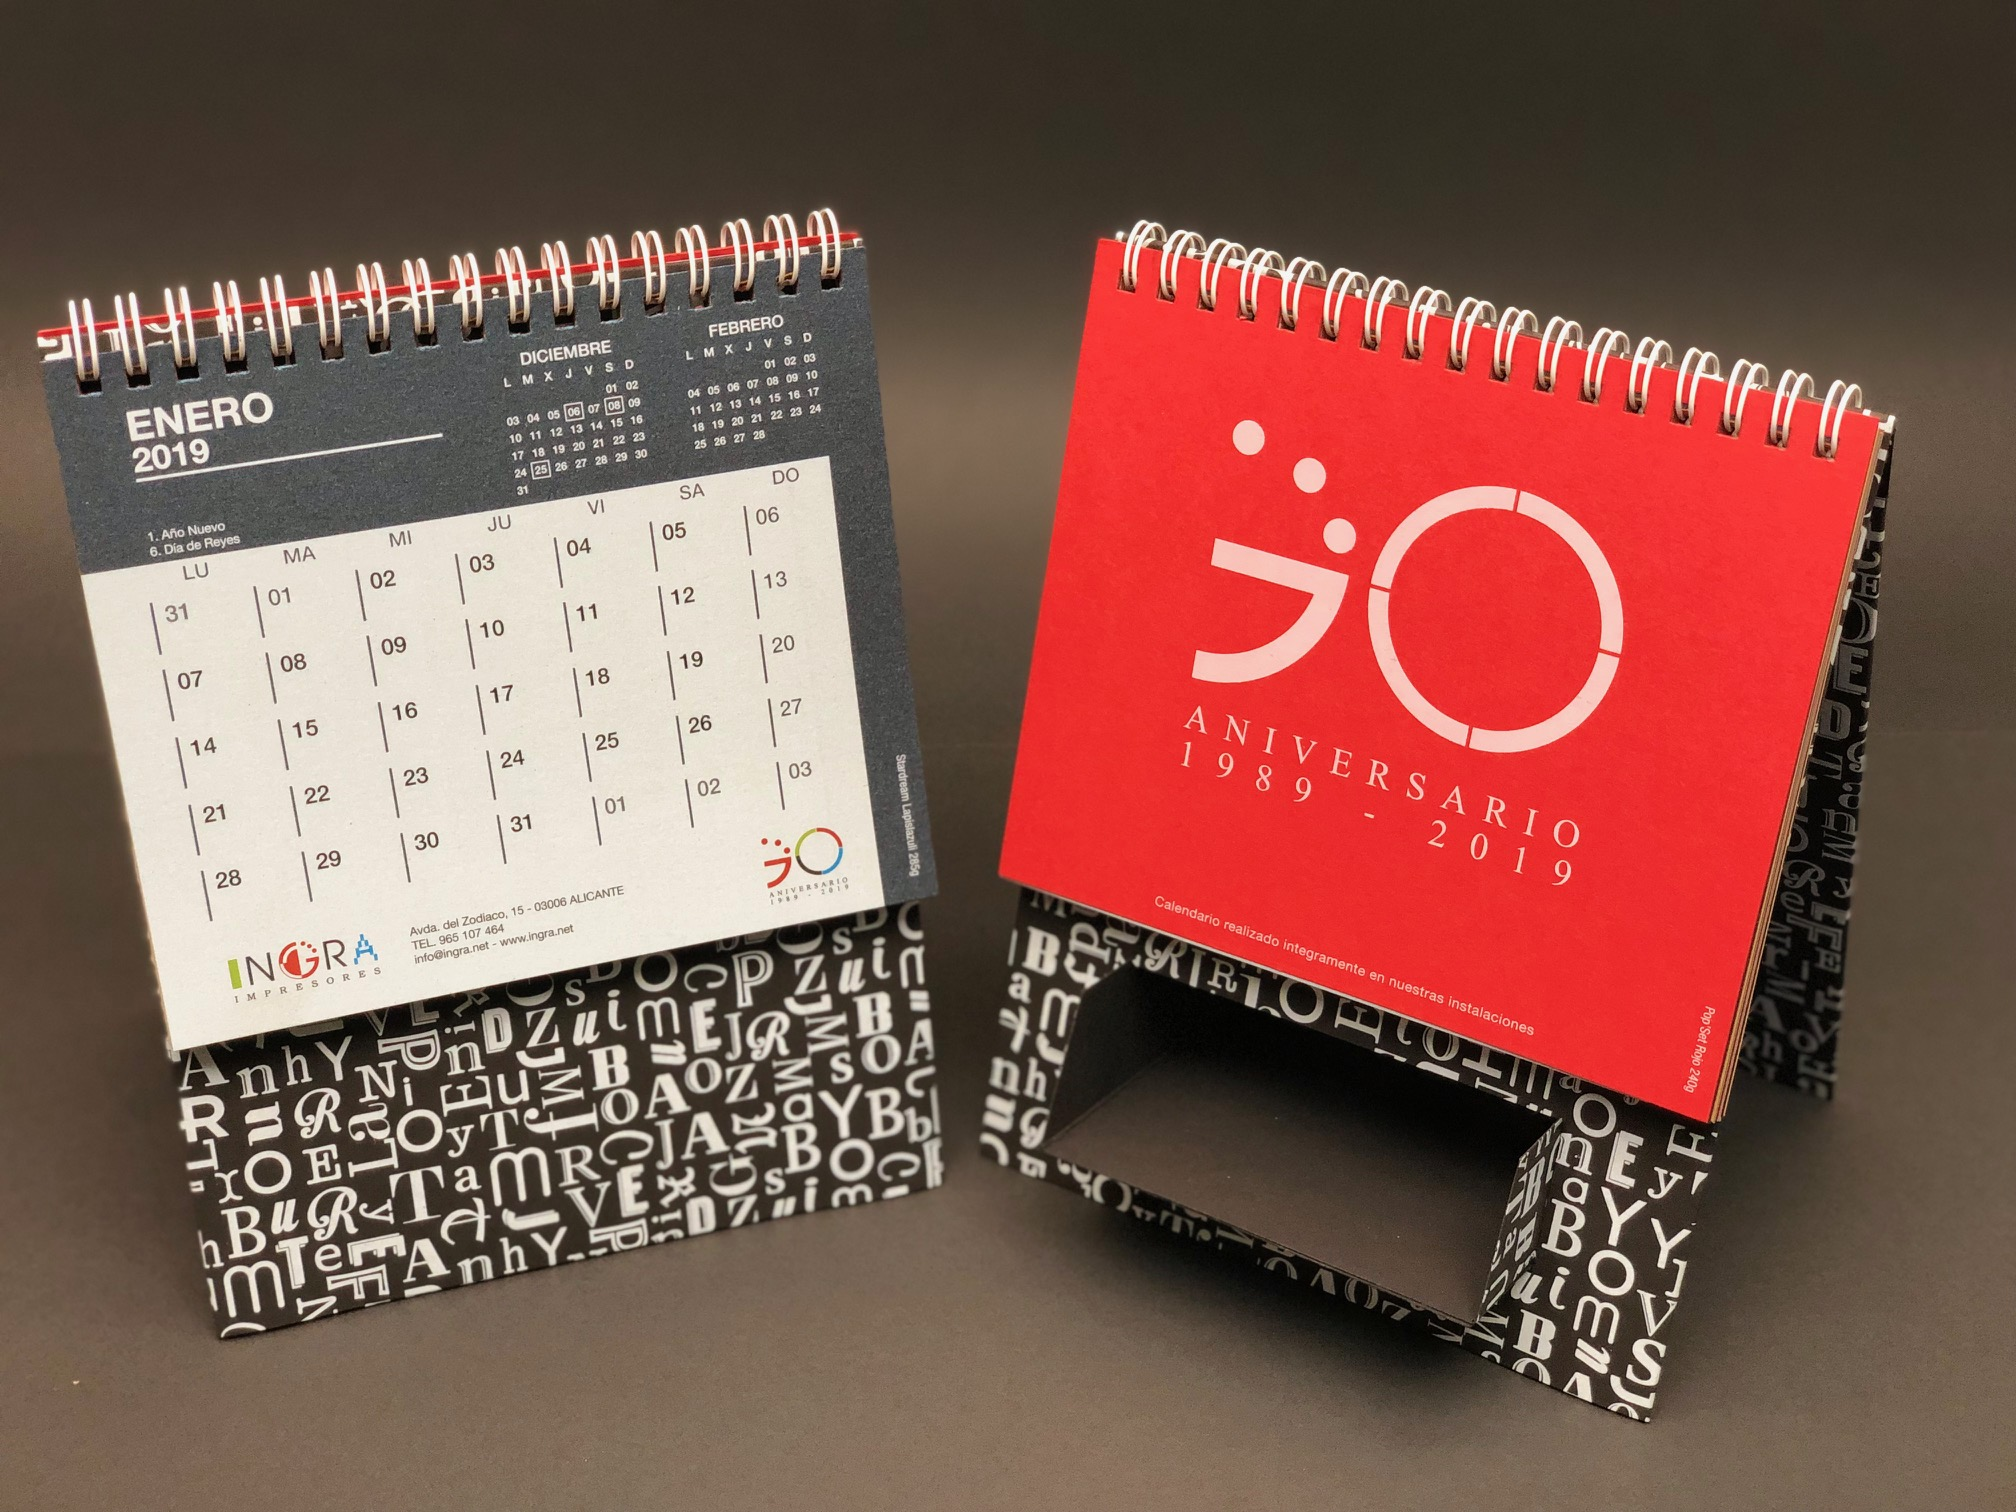 calendario ingra impresores 2019